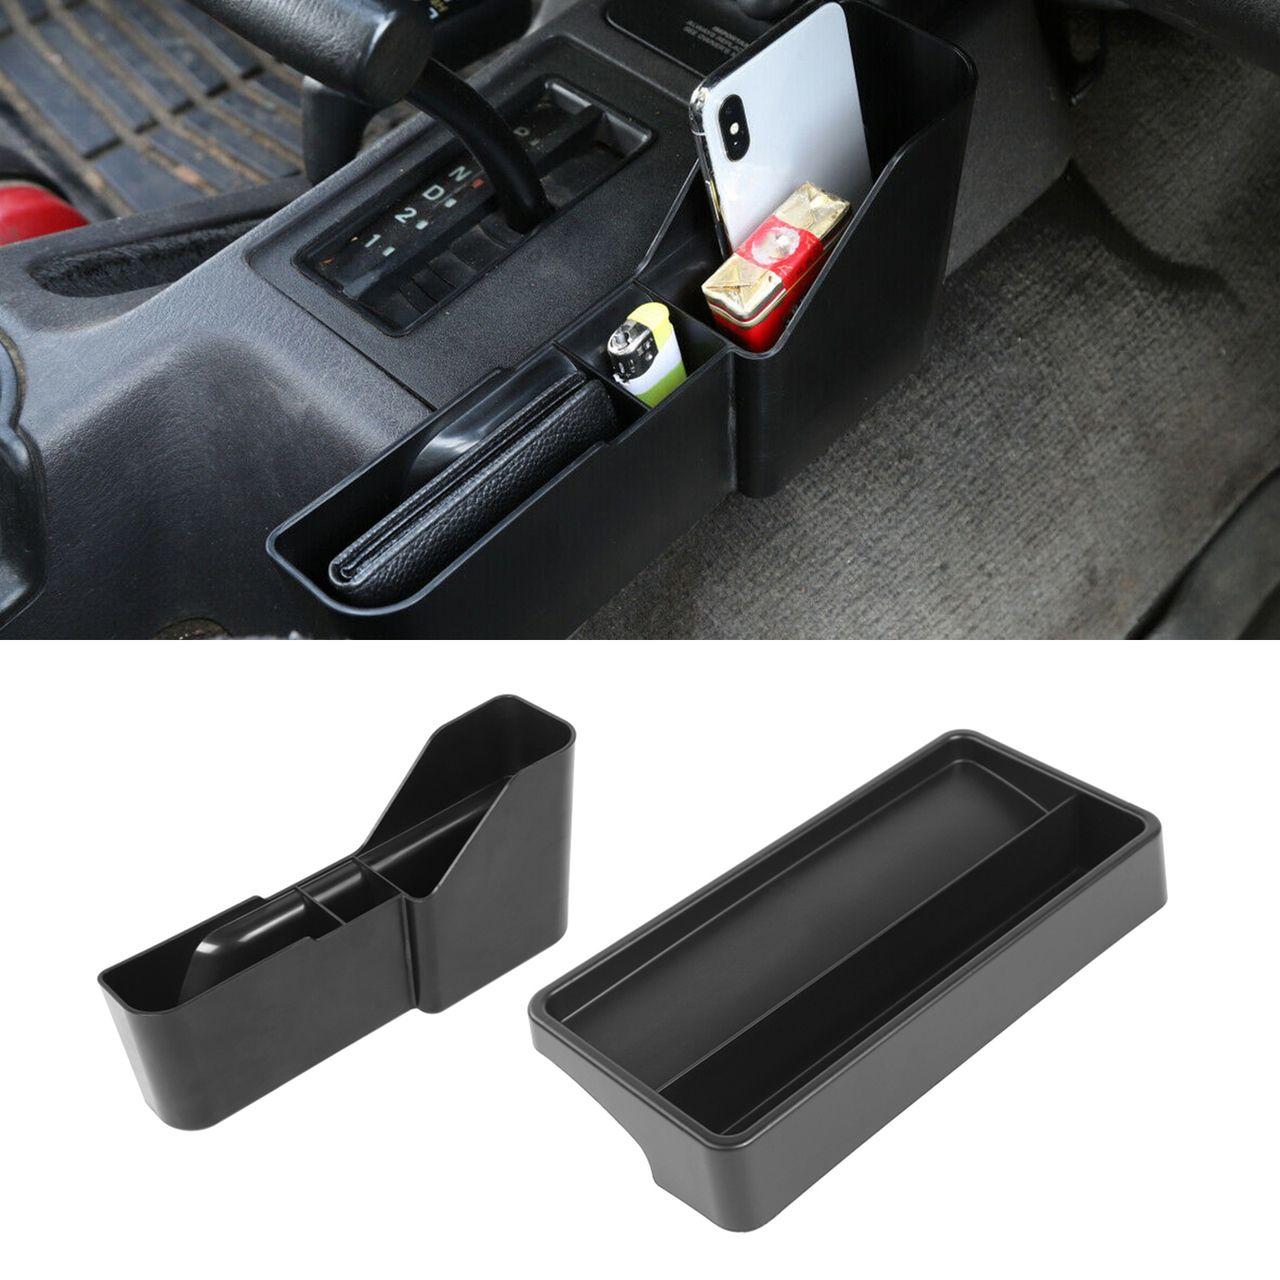 Interior Gear & Dashboard Storage Box Organizer For